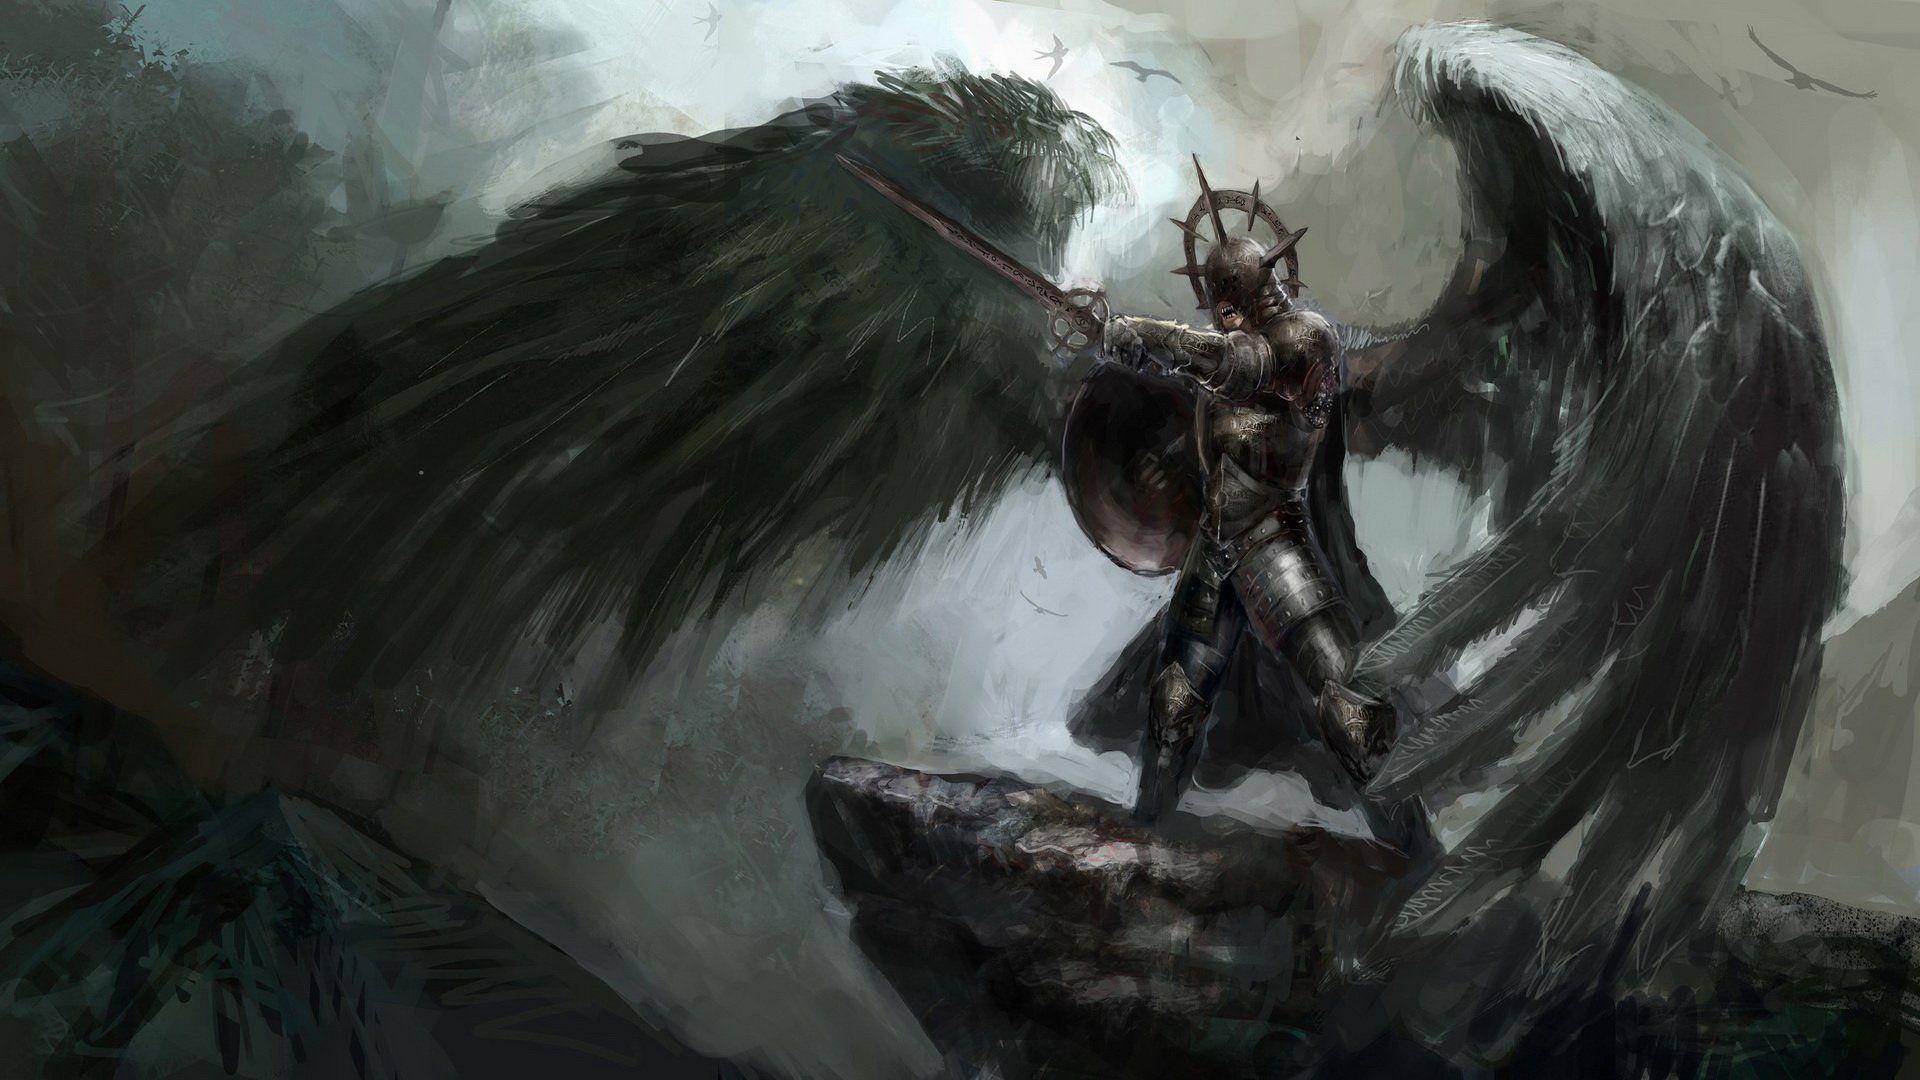 Seraphim wallpaper